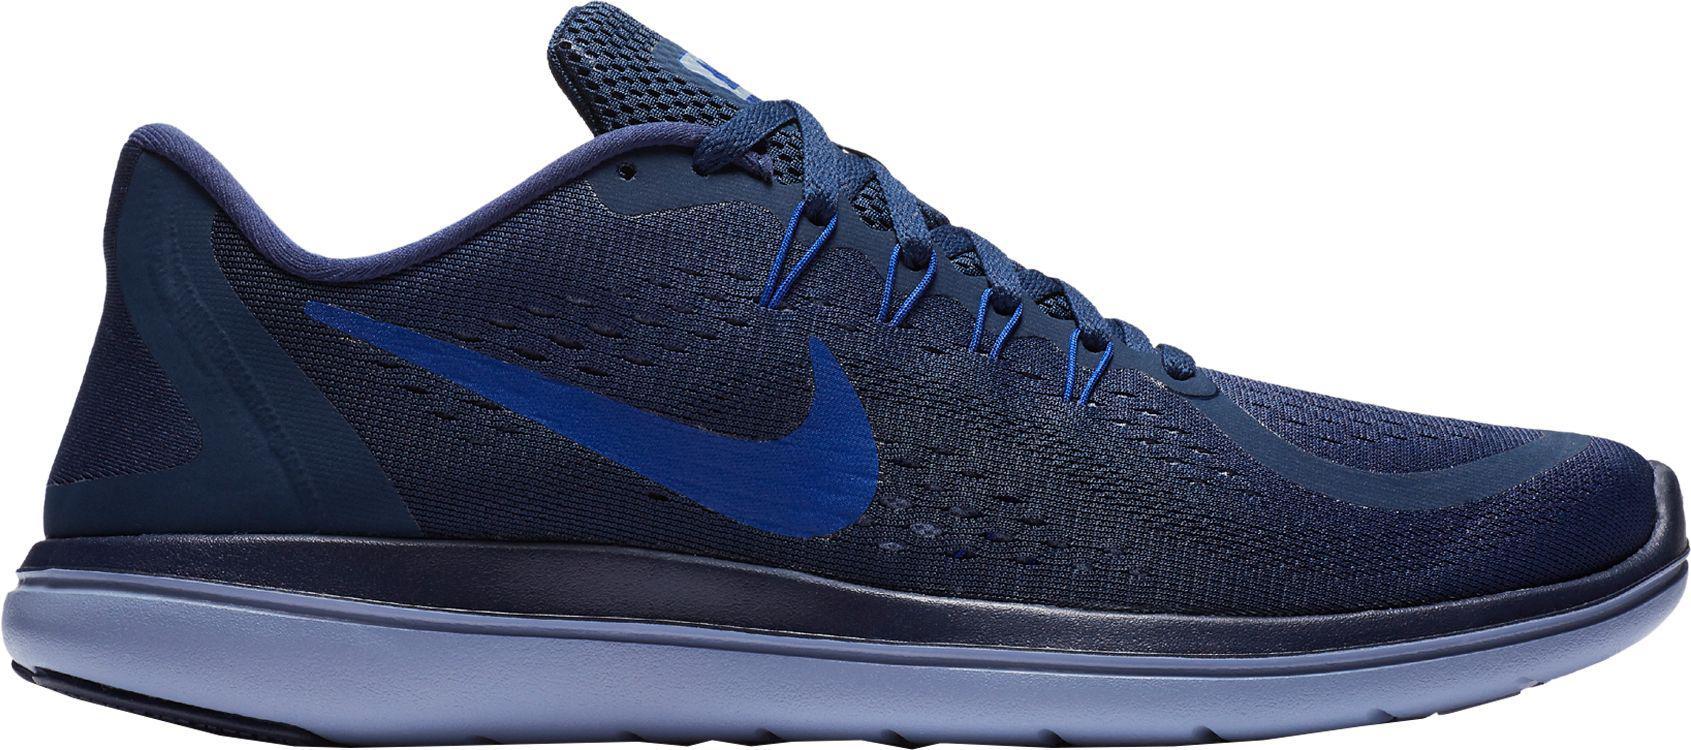 save off 04eaa c524f Men's Blue Flex 2017 Rn Running Shoes